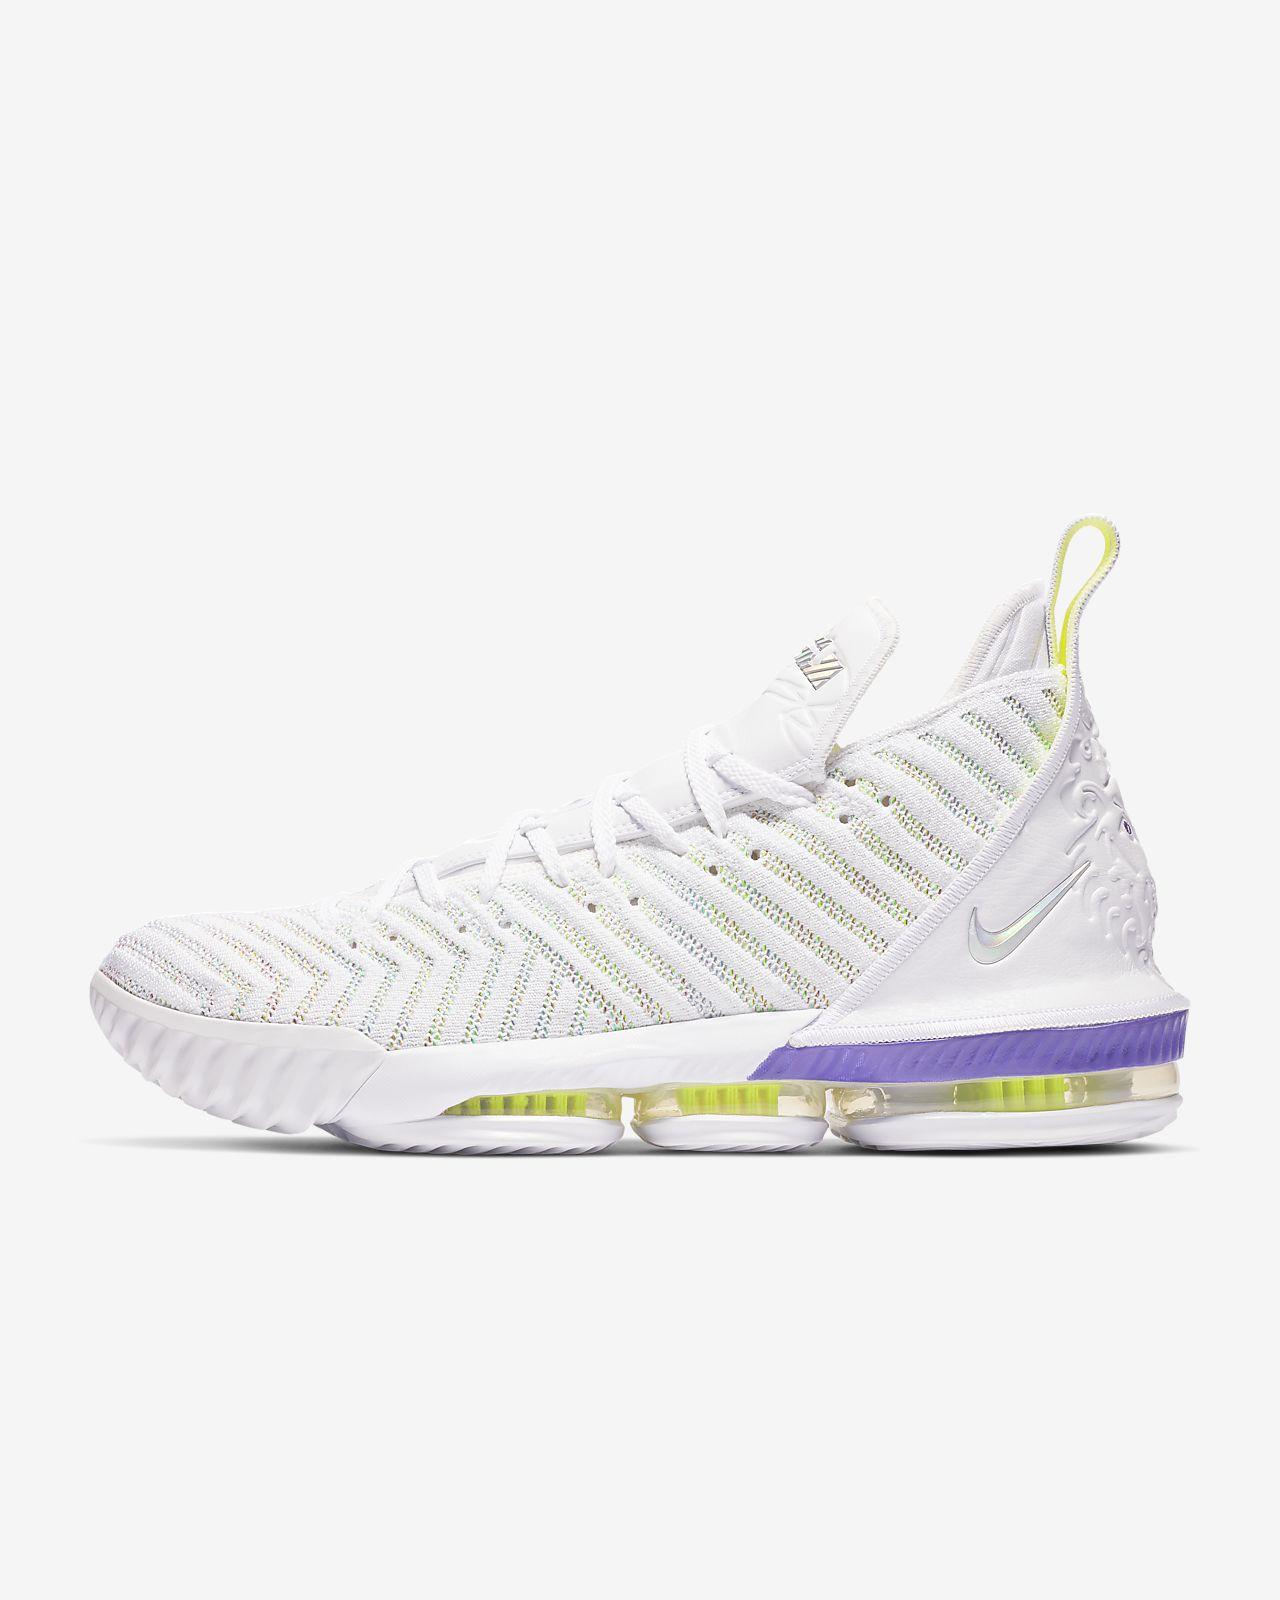 db51ab561b4 Low Resolution LeBron 16 Zapatillas de baloncesto LeBron 16 Zapatillas de  baloncesto